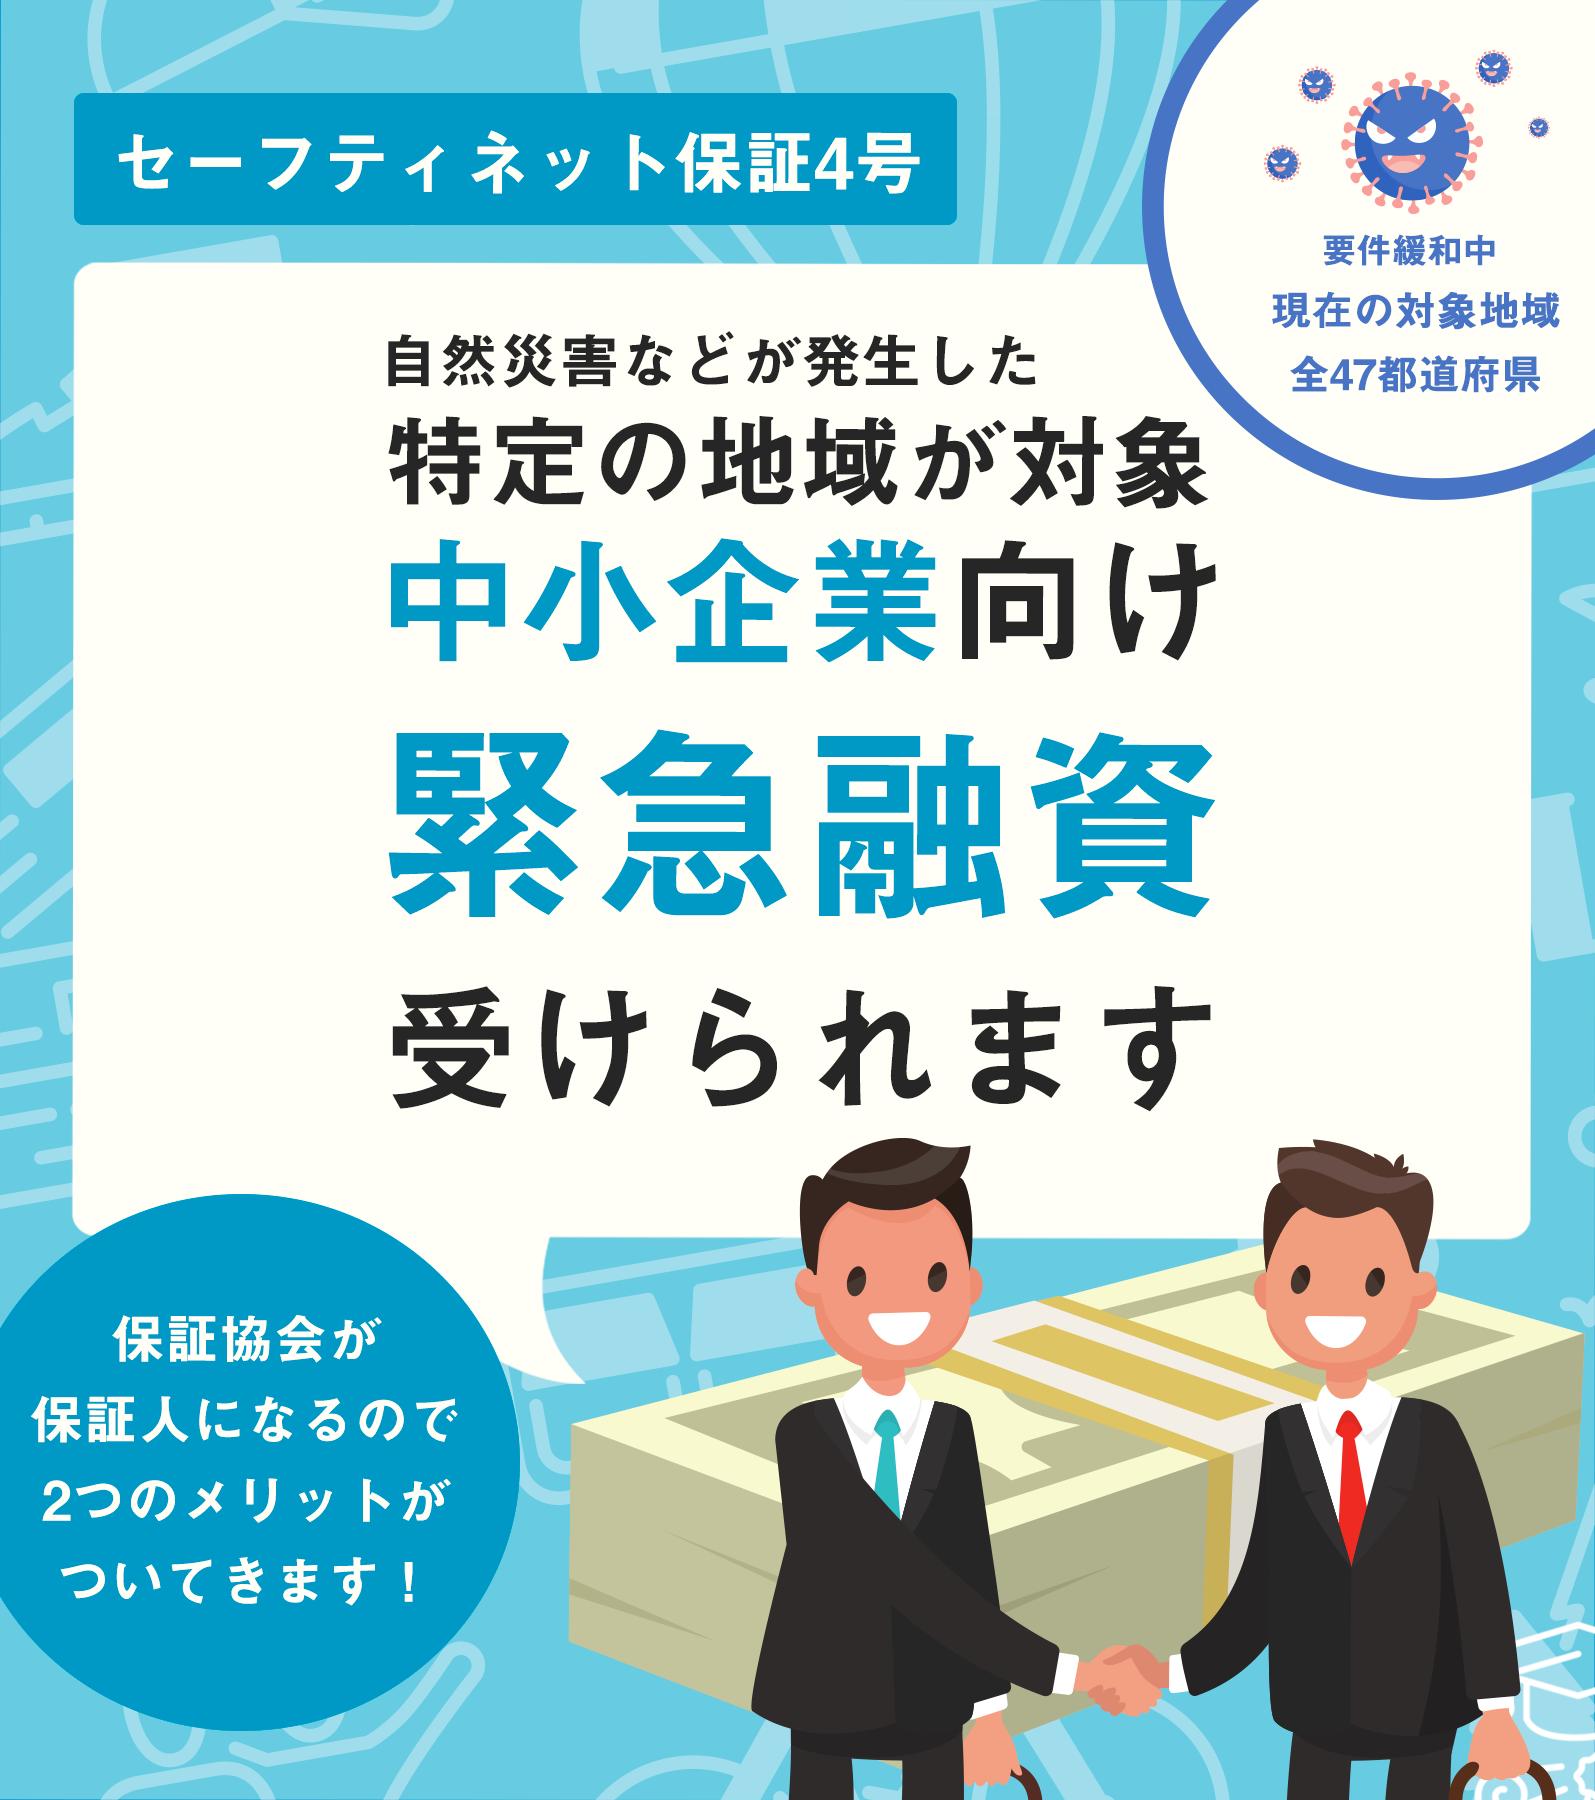 edc545ff10cff485bef7ee42a86446ad - 【日本中の中小企業向け】保証付きで5.6億借りれます!